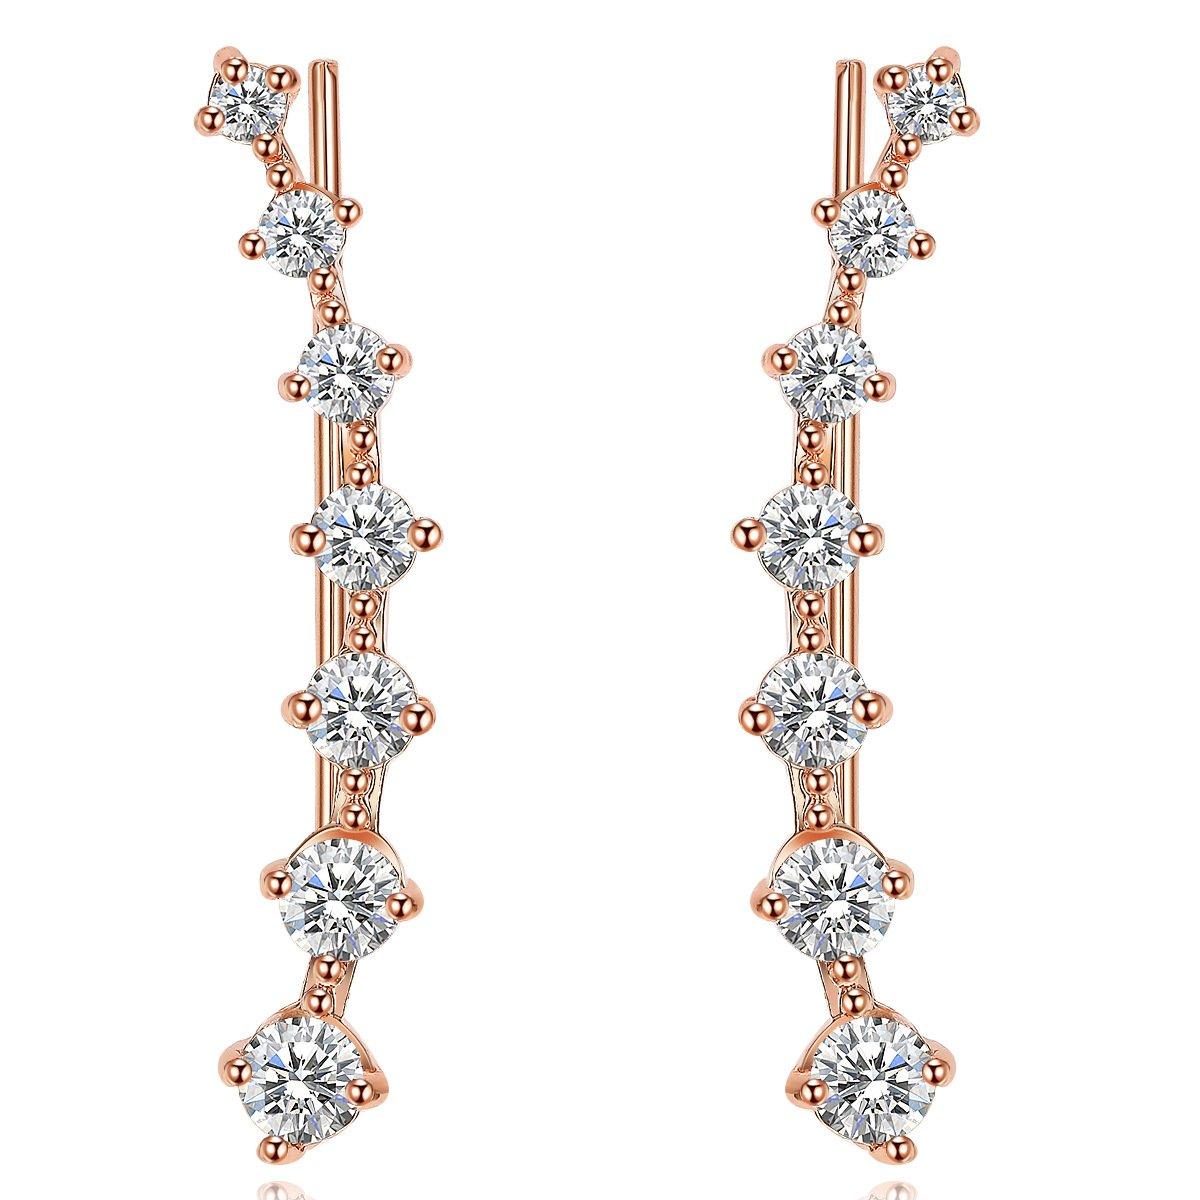 UMODE Jewelry Cartilage Tragus Bar Each with 7 Tiny Cubic Zirconia CZ Diamond Wrap Ear Cuff Earrings For Women yiwu xilin trading company ltd. UE0197ACA